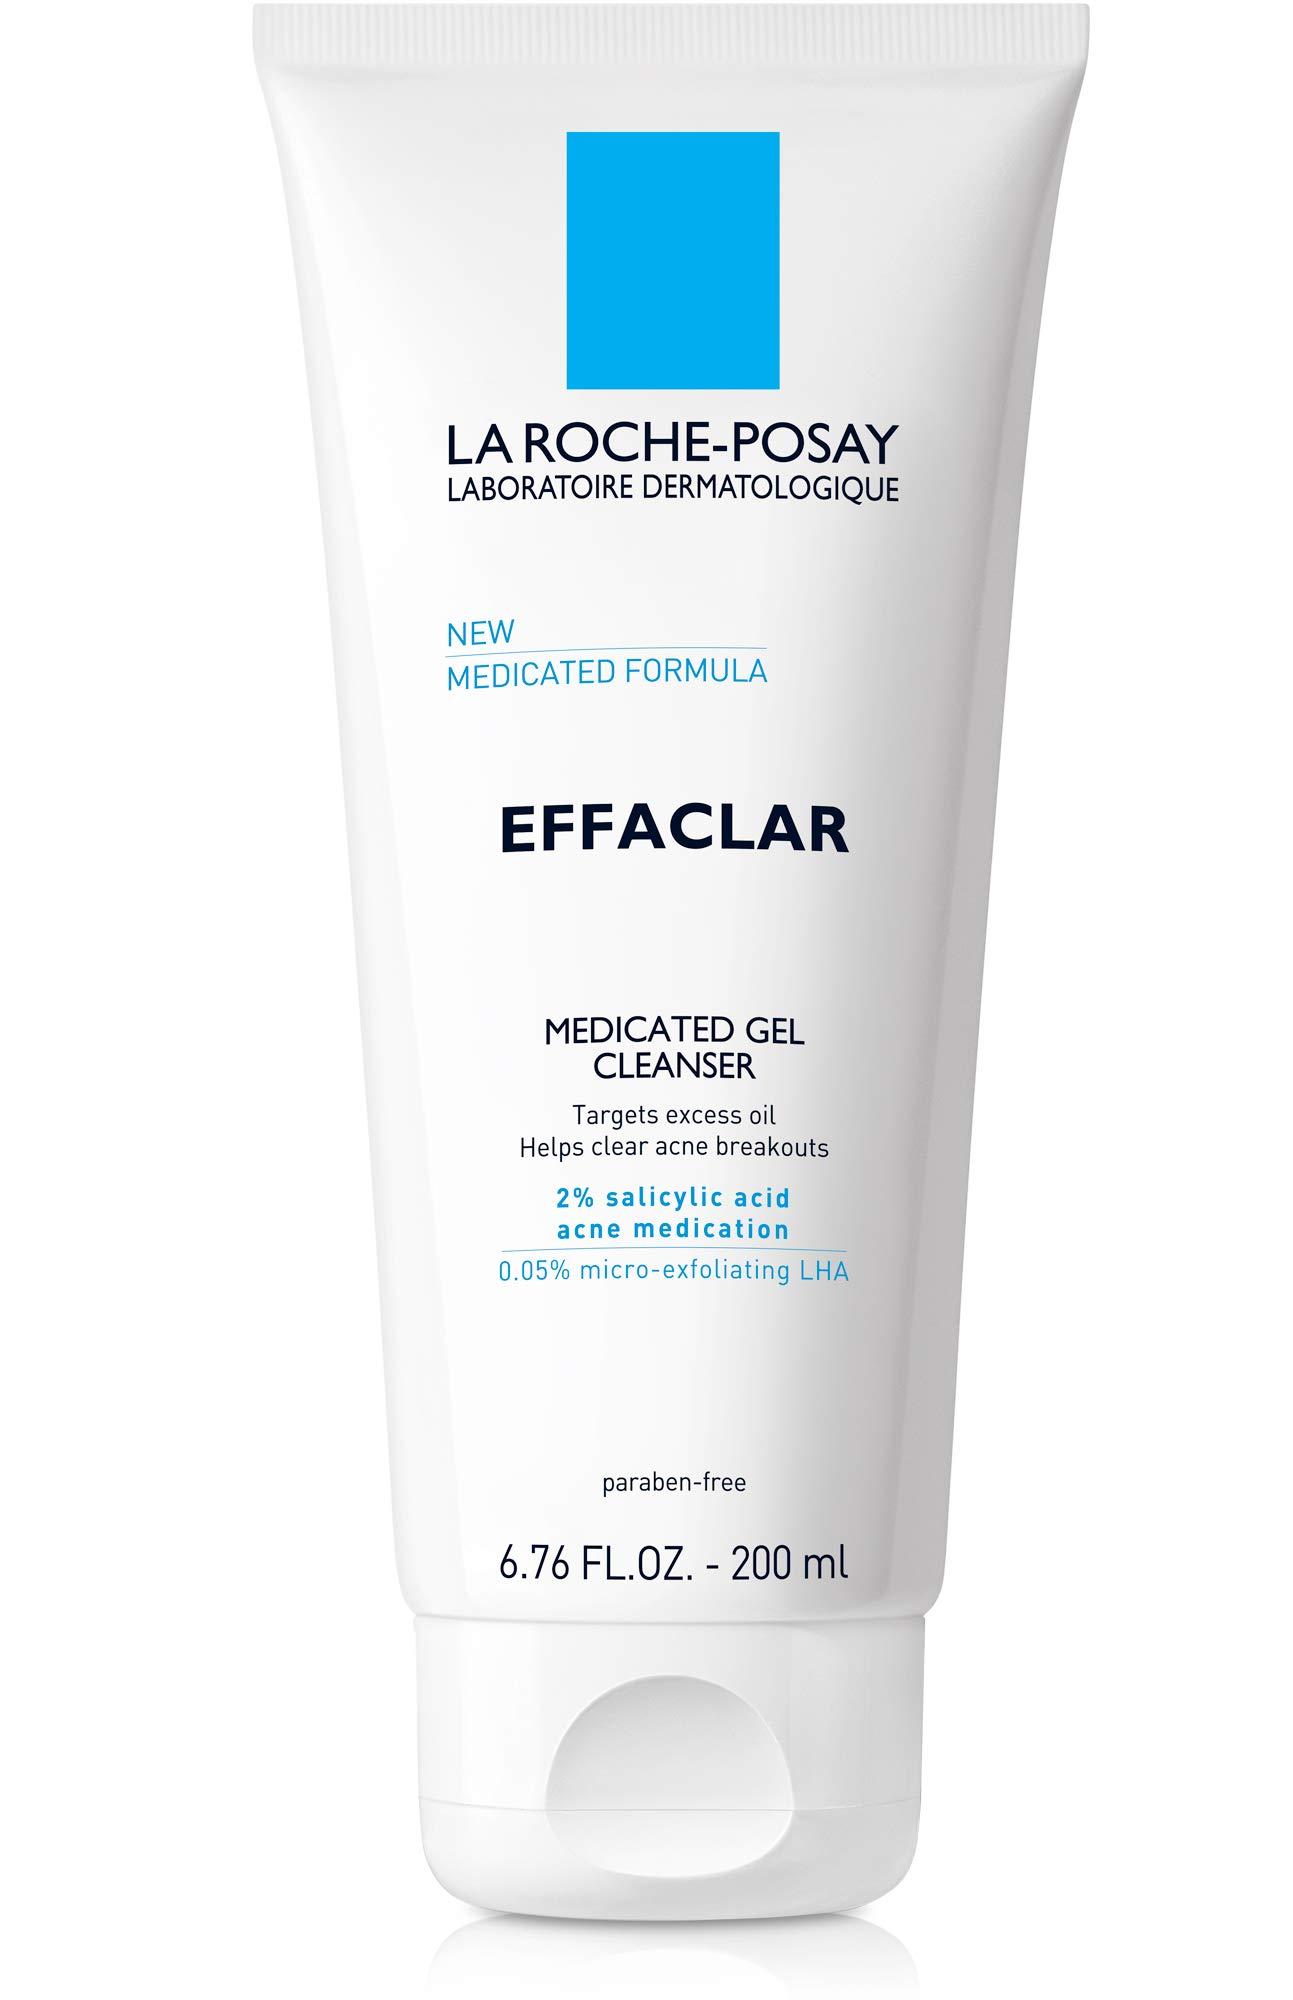 La Roche-Posay Effaclar Medicated Gel Acne Cleanser, 6.76 Fl. Oz. by La Roche-Posay